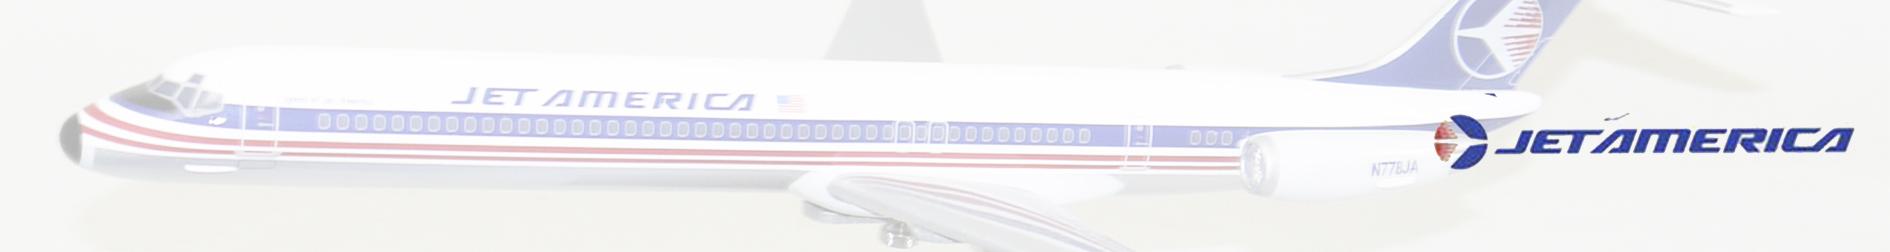 jet-america.jpg